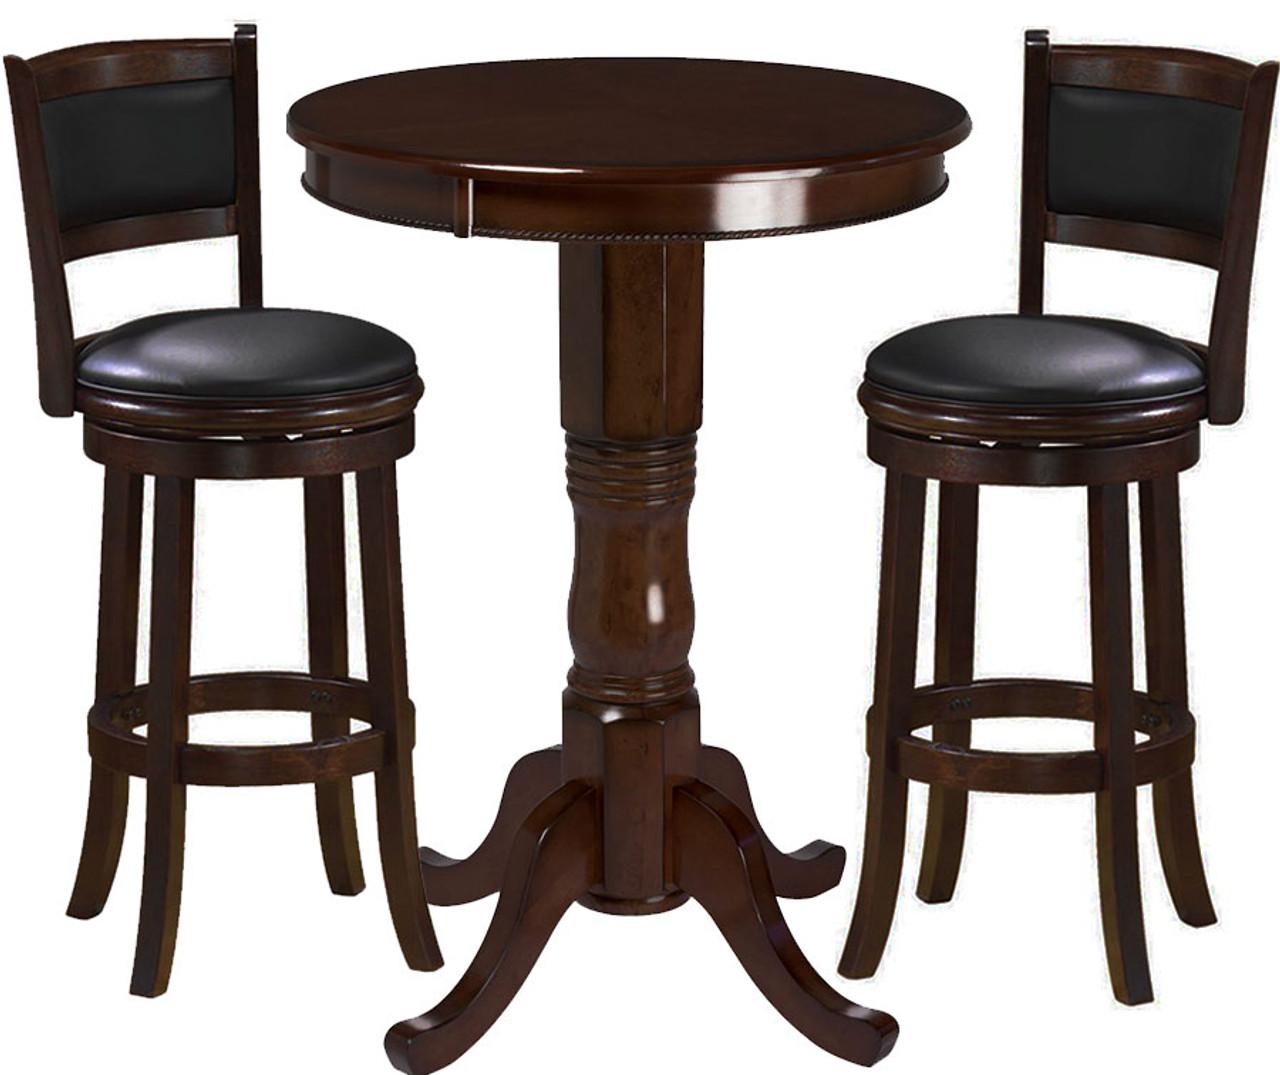 Ram Pub Table Set 3 Piece Cappuccino